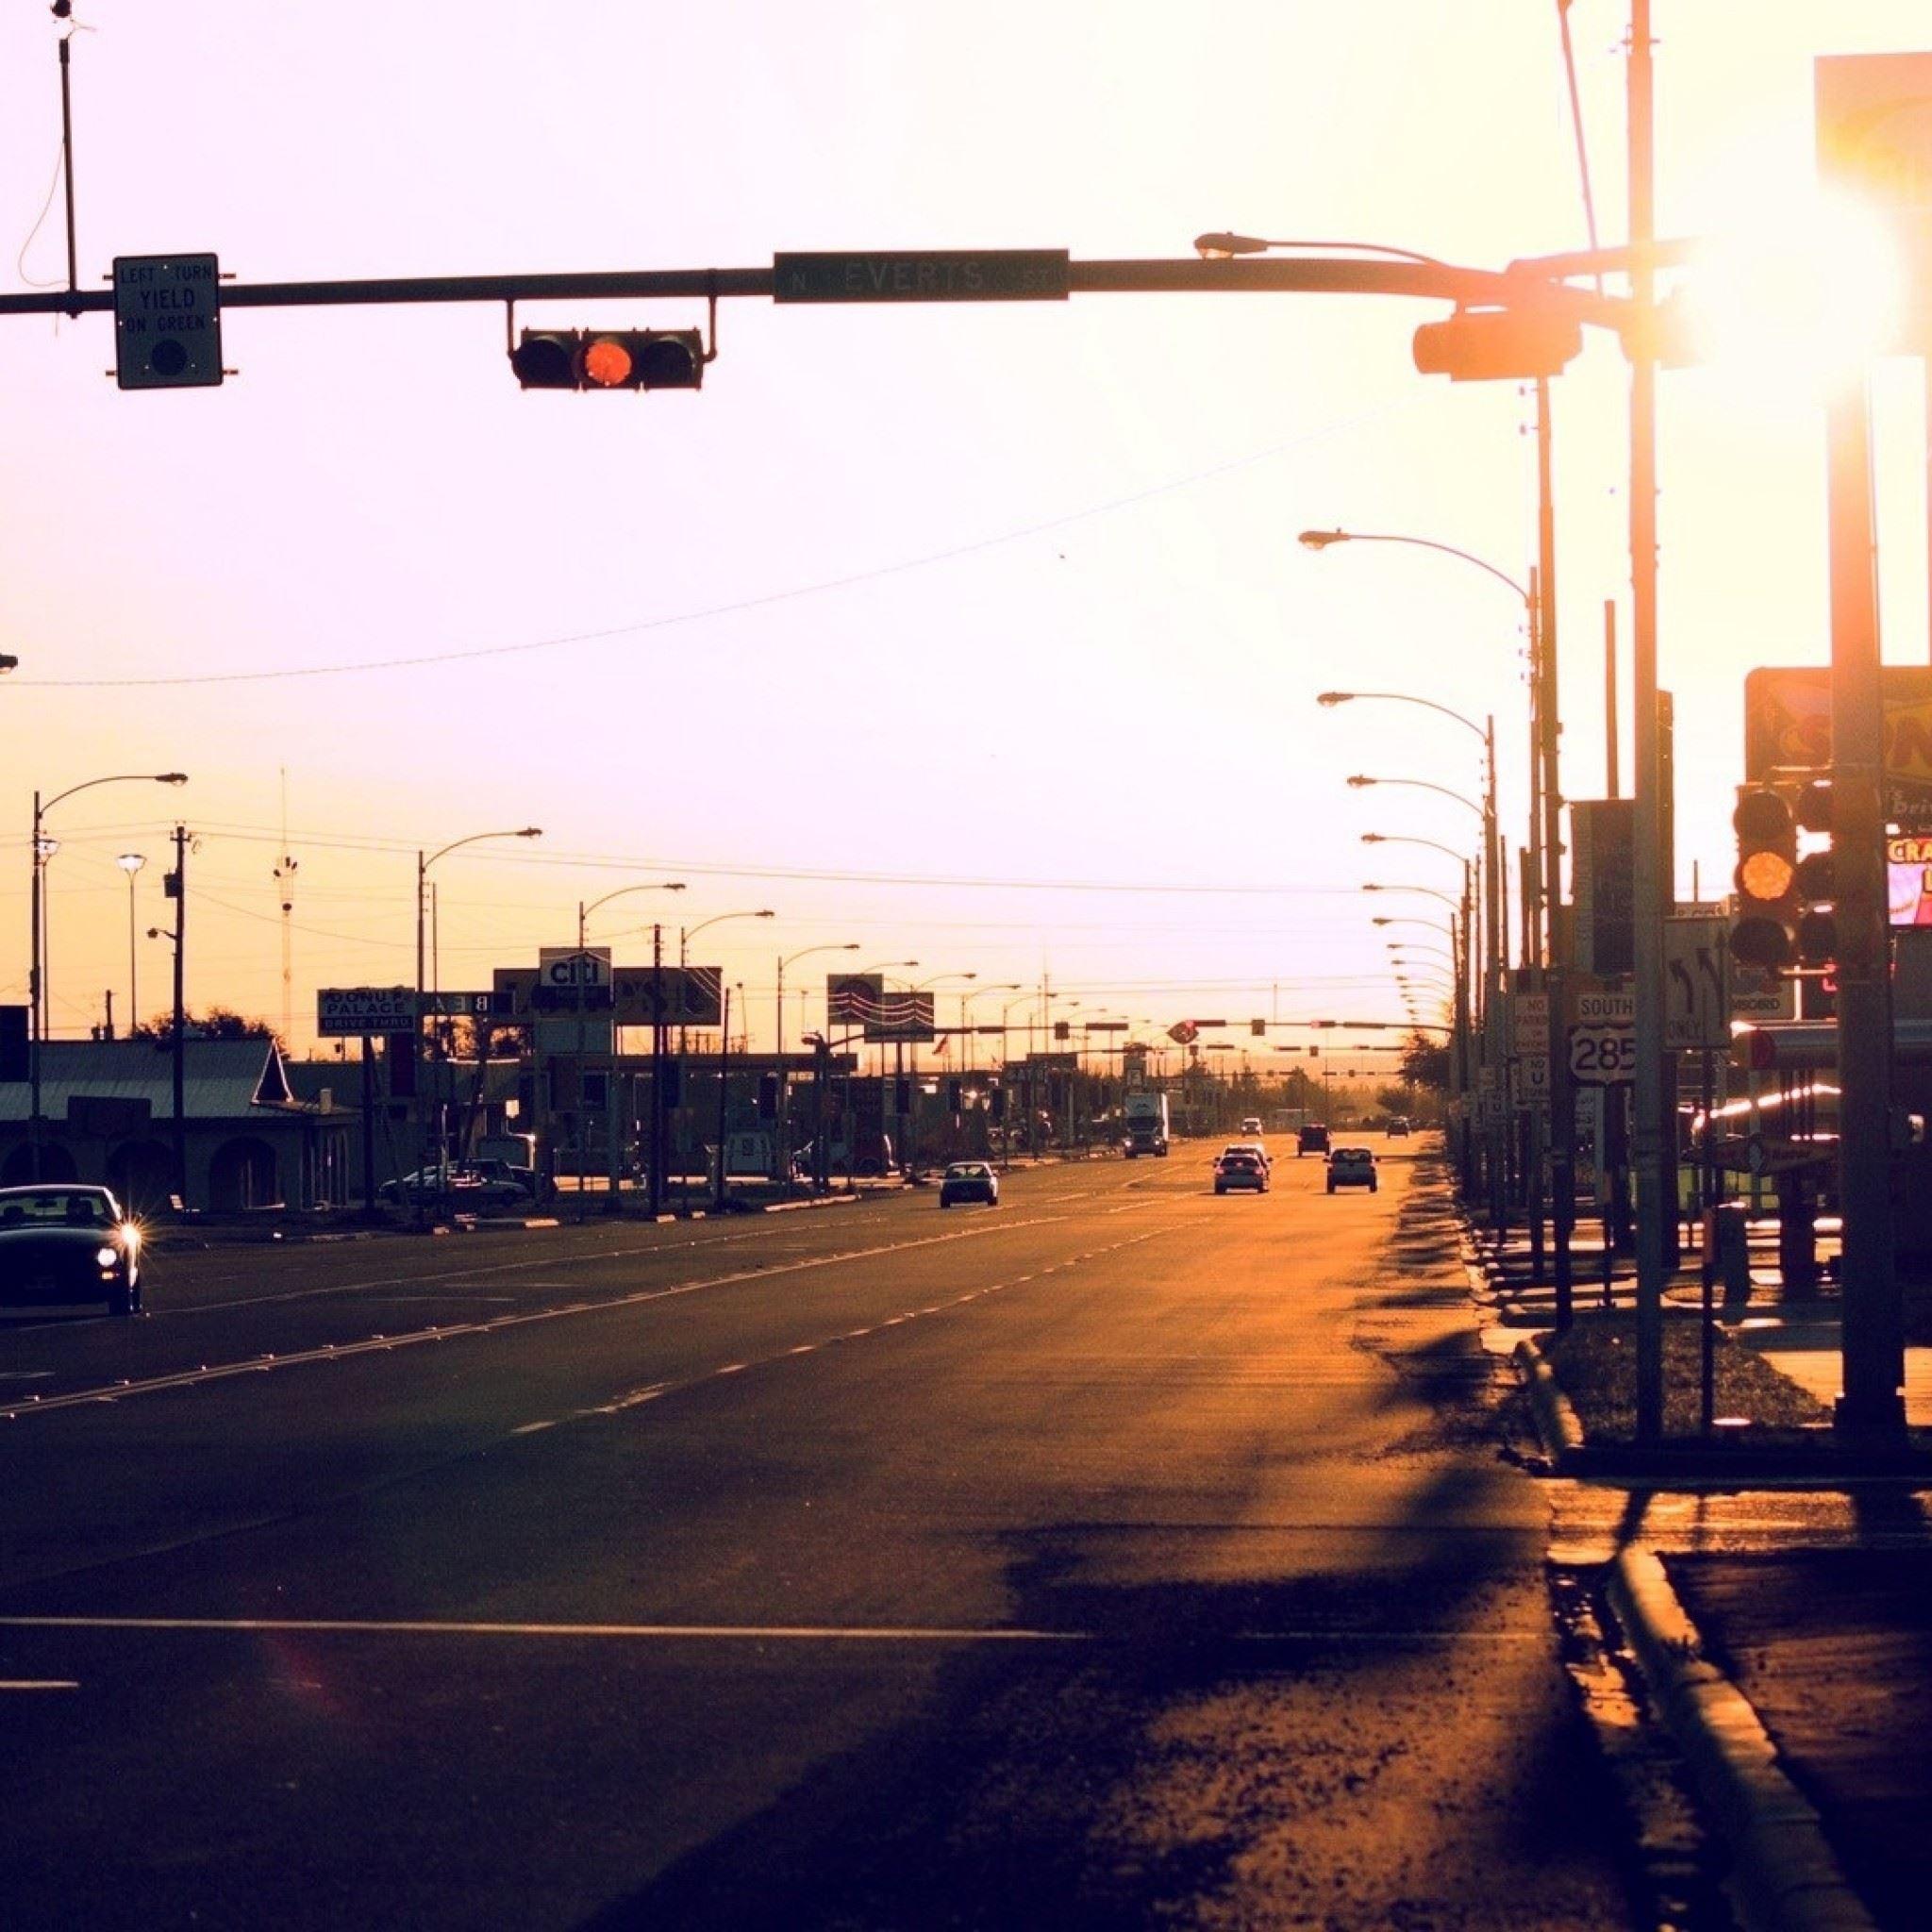 ... Sunset Street Traffic Light Car iPad Air wallpaper.